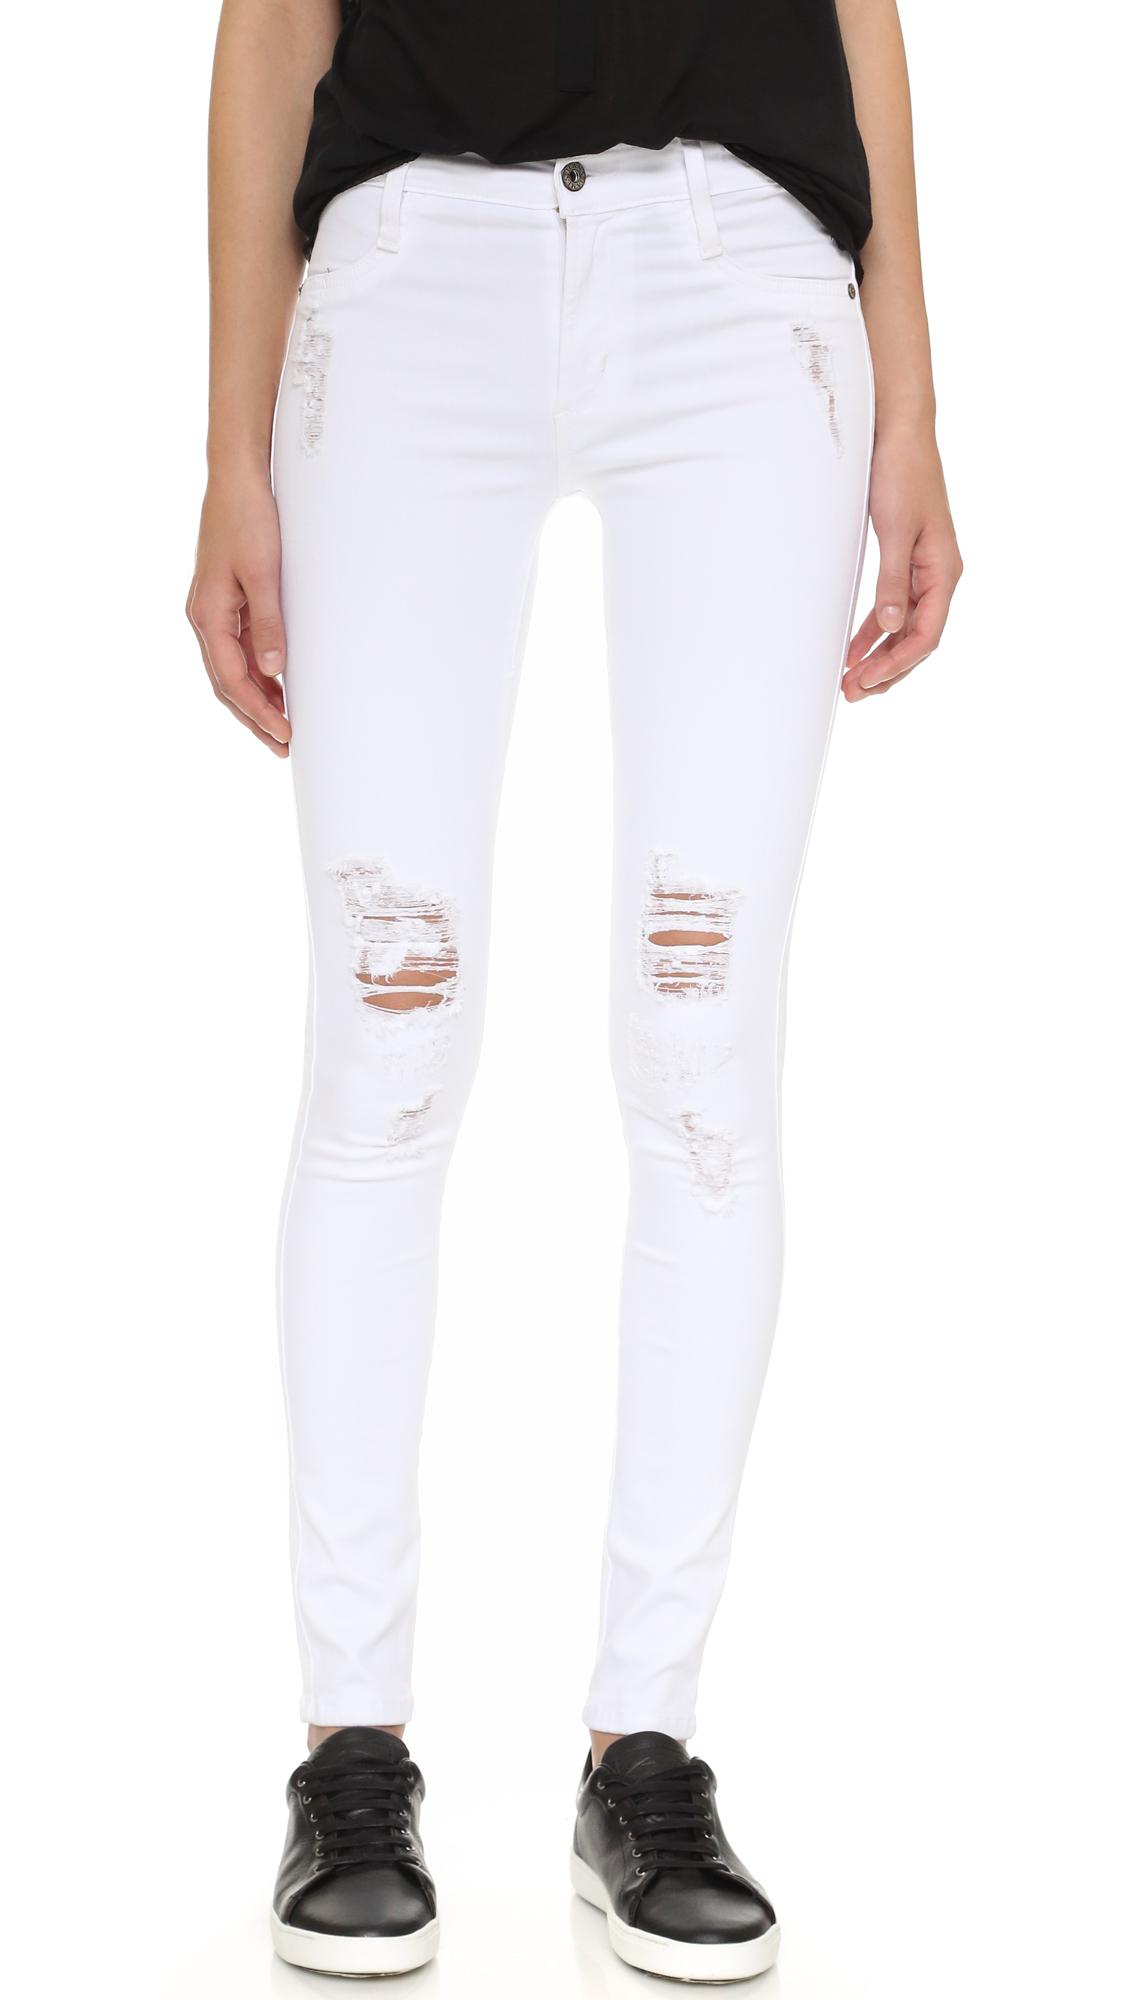 7d8a59f6622bb James Jeans Twiggy Ultra Flex Legging Jeans | SHOPBOP